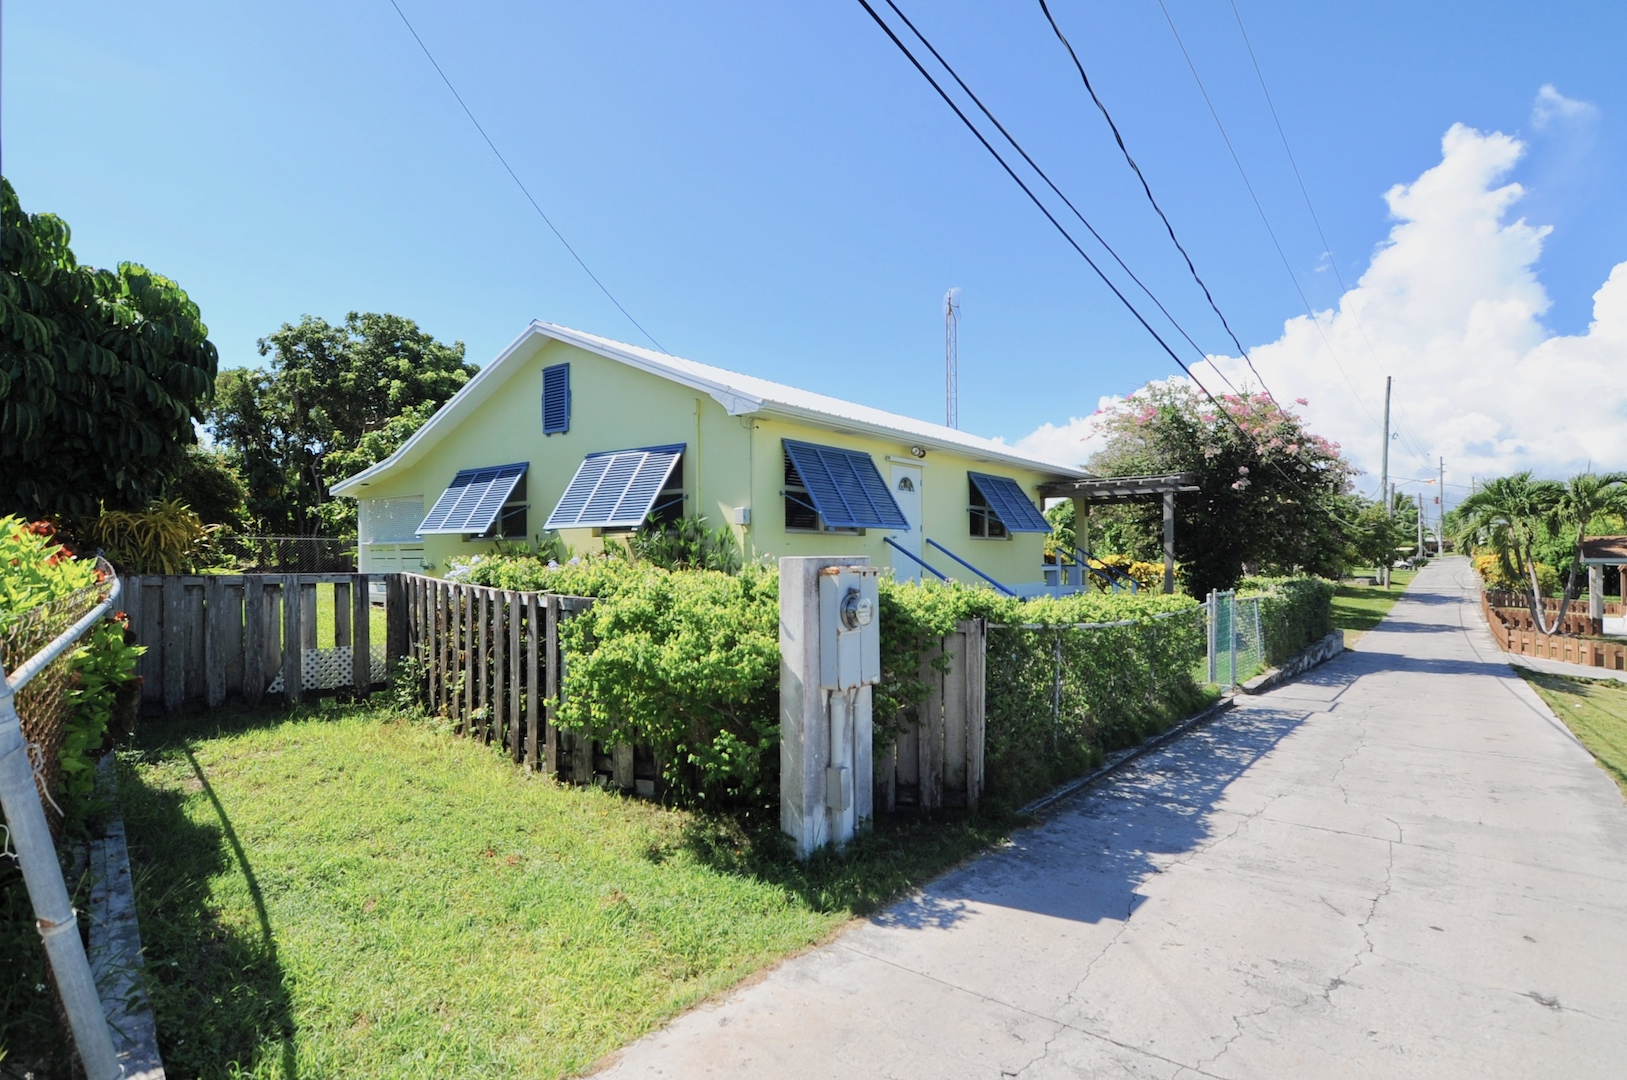 Home for sale in Man-O-War Cay Abaco Bahamas near marinas restaurants and the beach